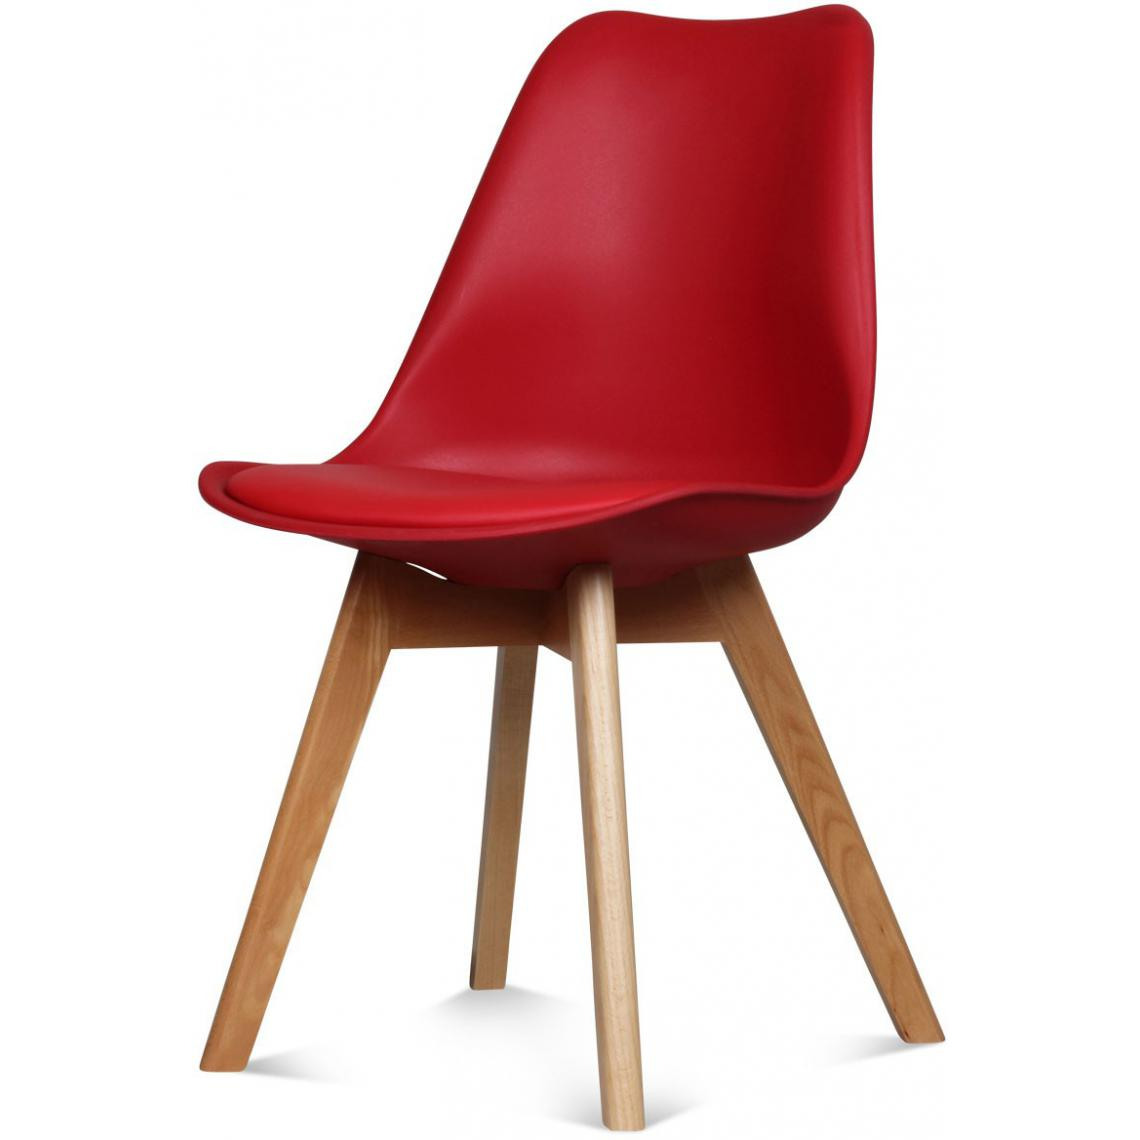 chaise design style scandinave rouge esben 3suisses. Black Bedroom Furniture Sets. Home Design Ideas